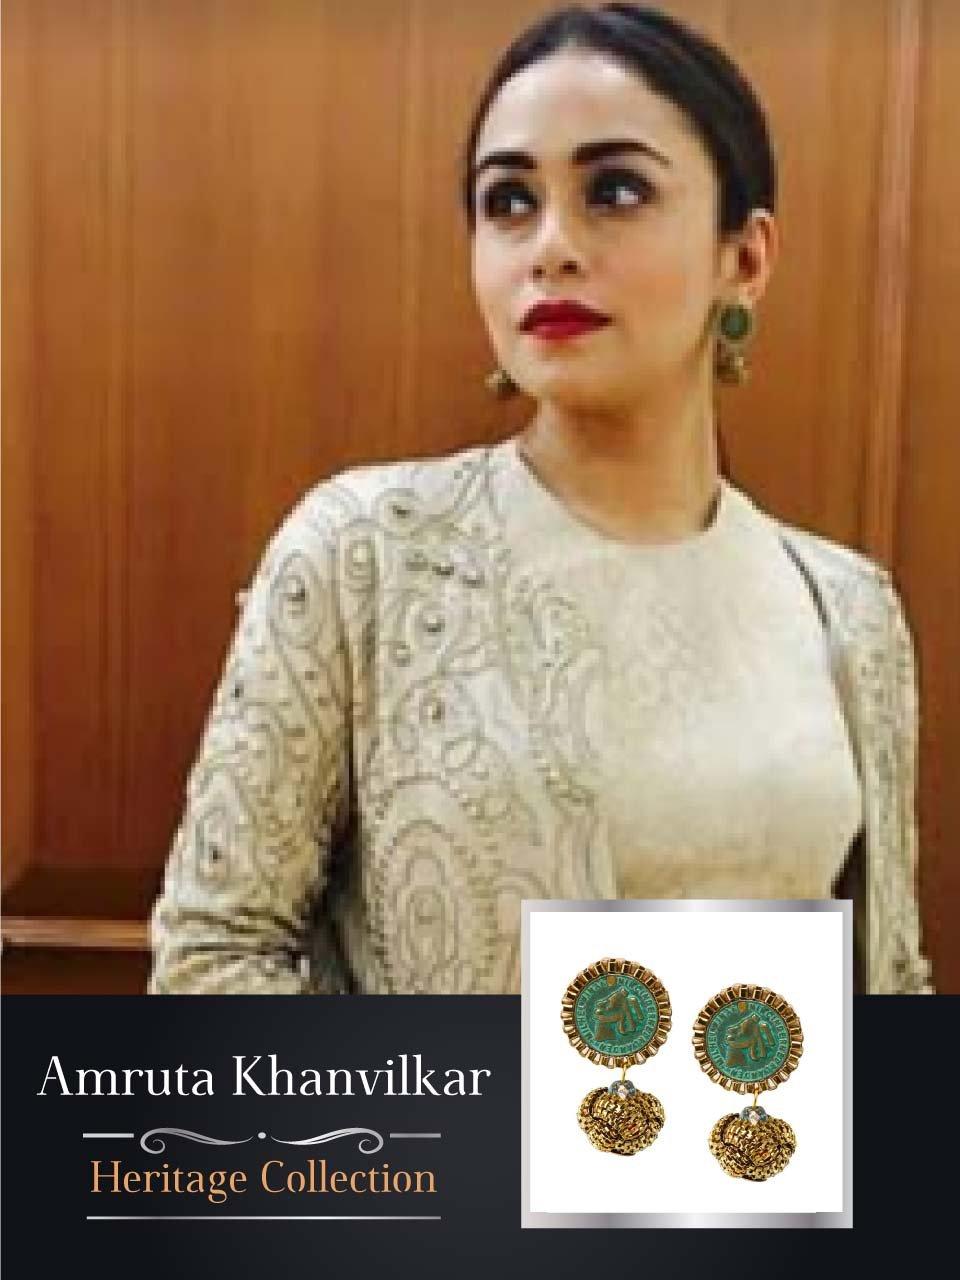 amruta-khanvilkar